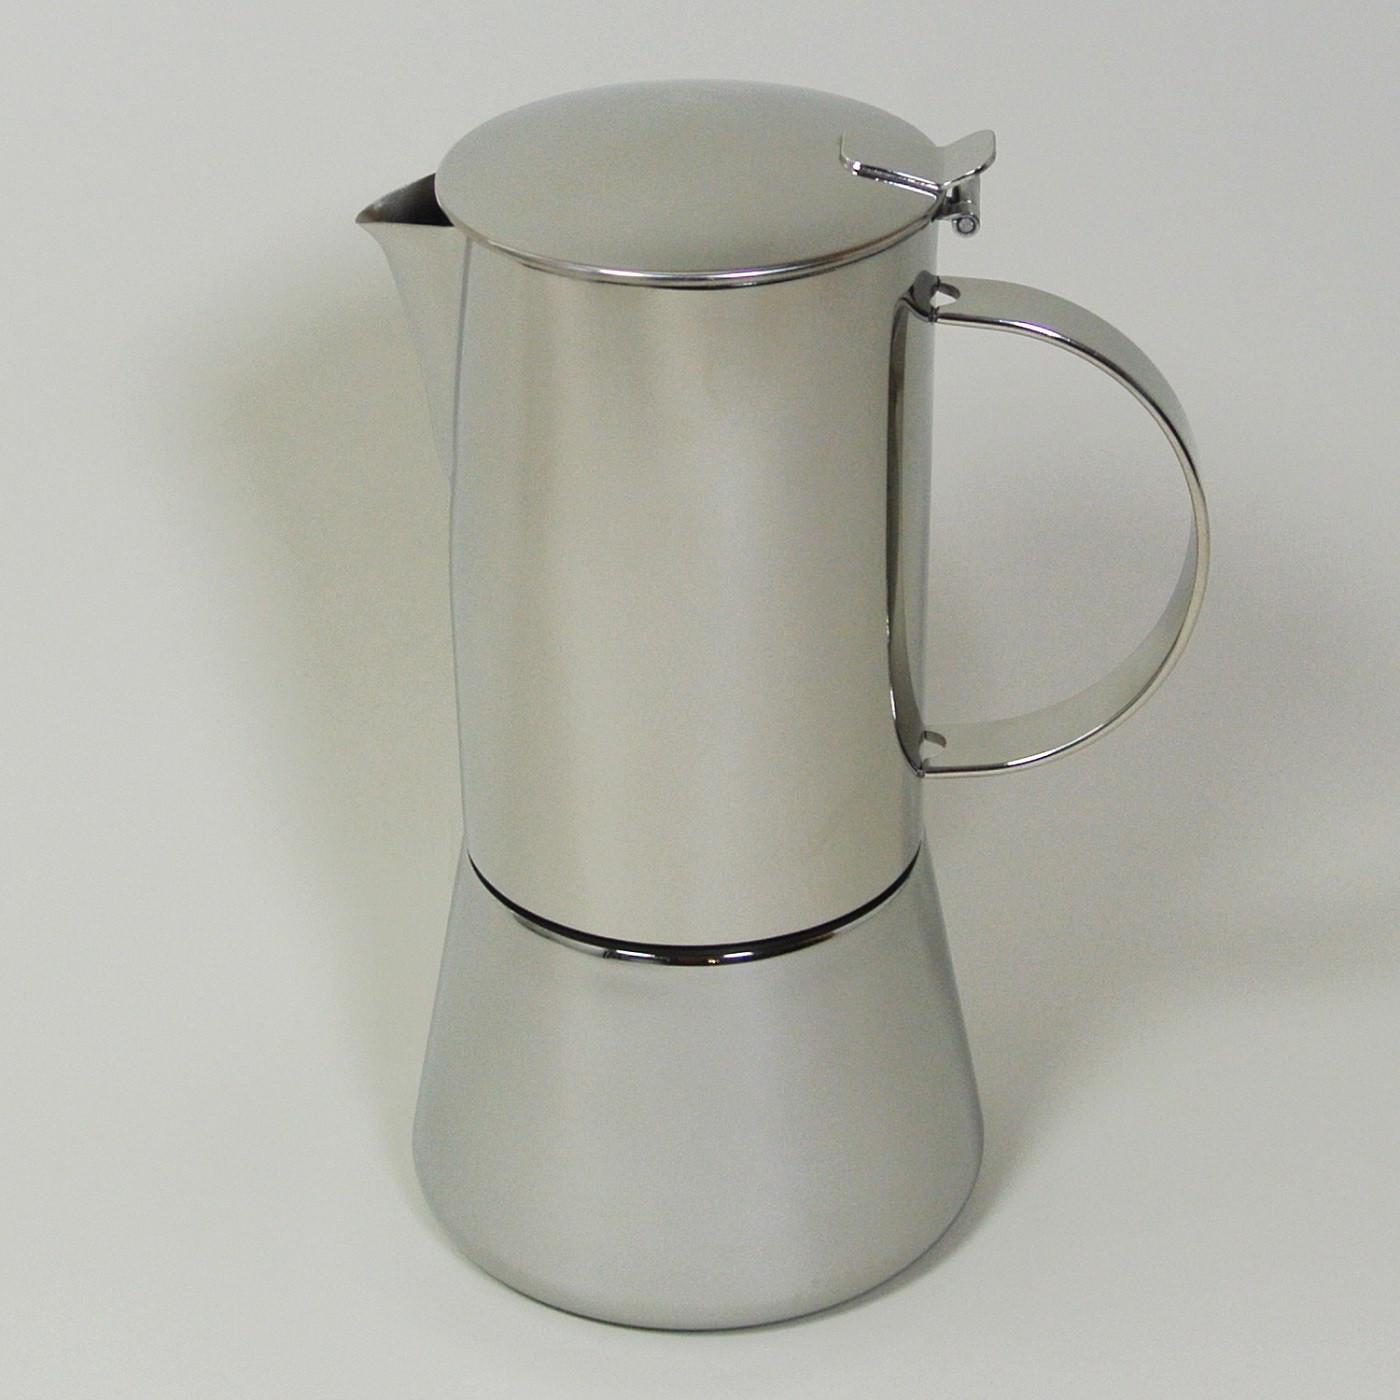 cilio Espressokocher Aida 6 Tassen